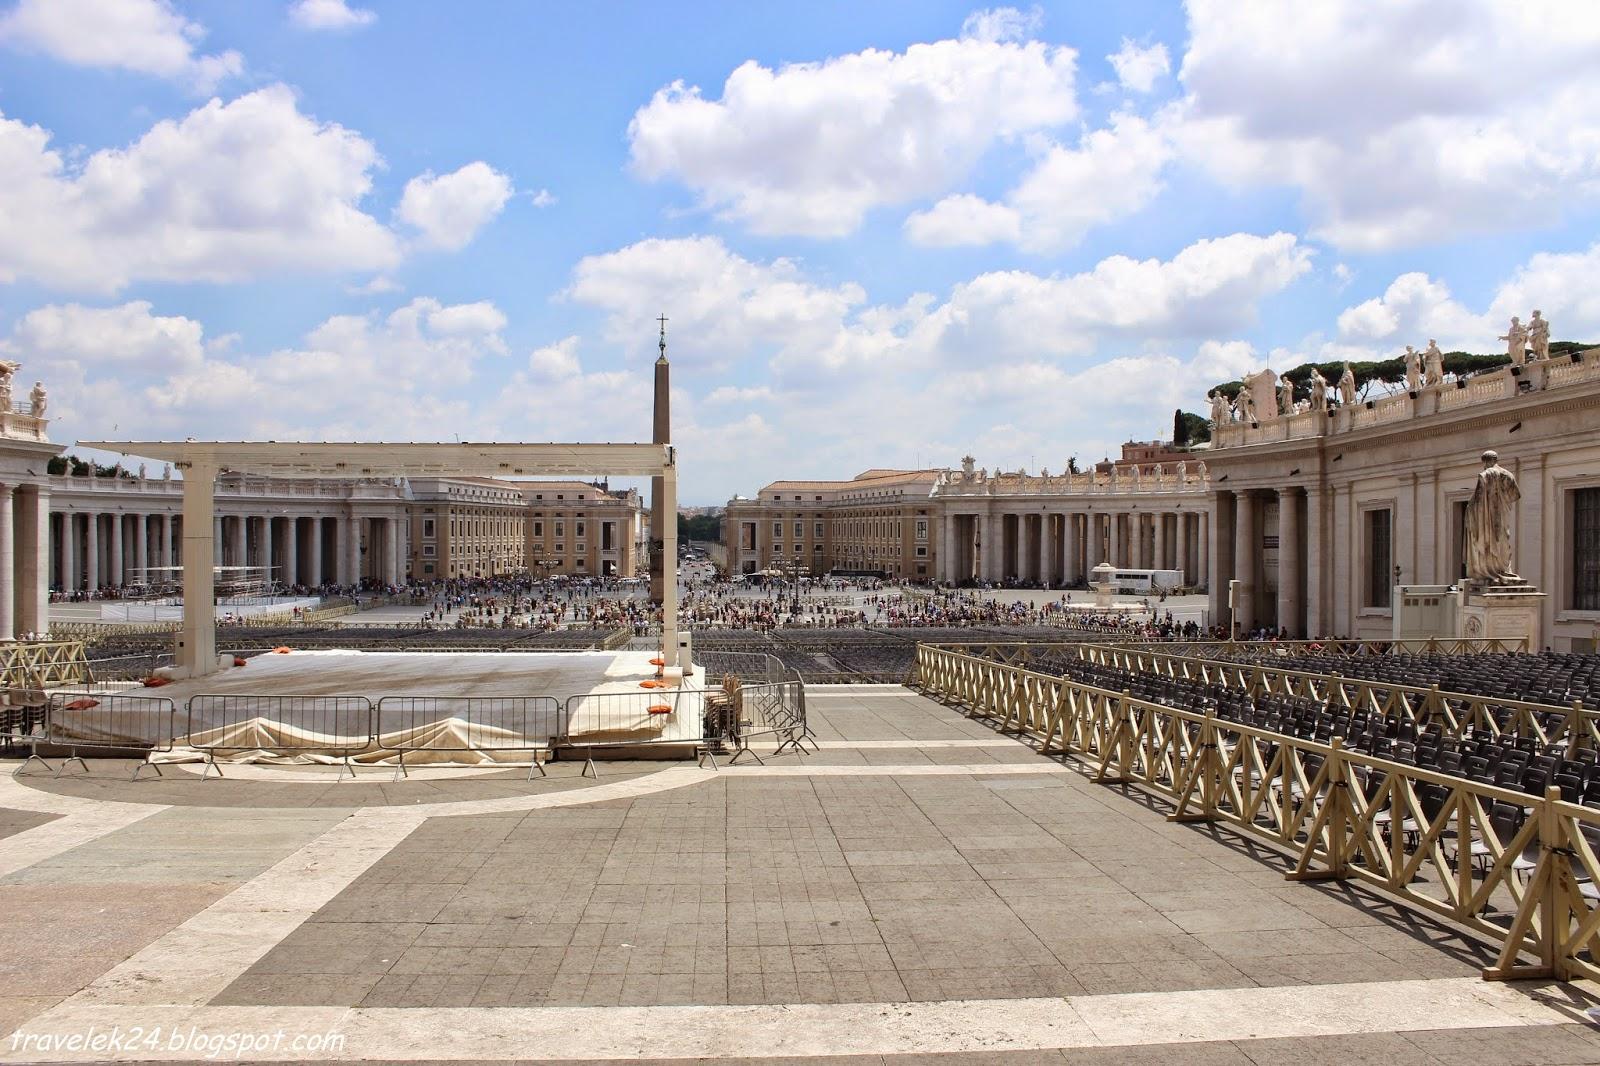 Plac św. Piotra Watykan